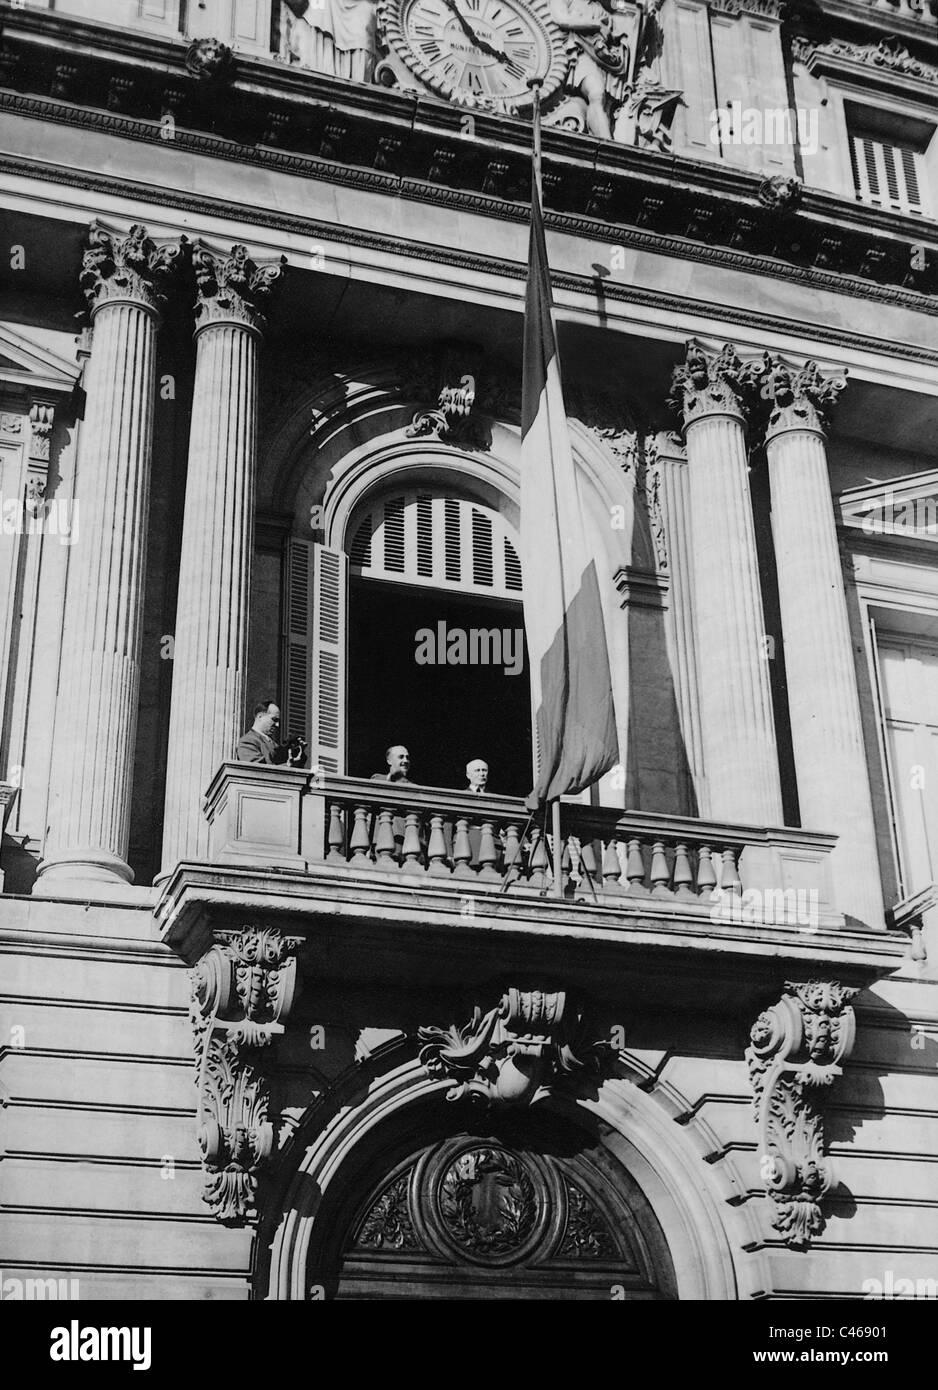 Henri Philippe Petain and Francisco Franco, 1941 - Stock Image